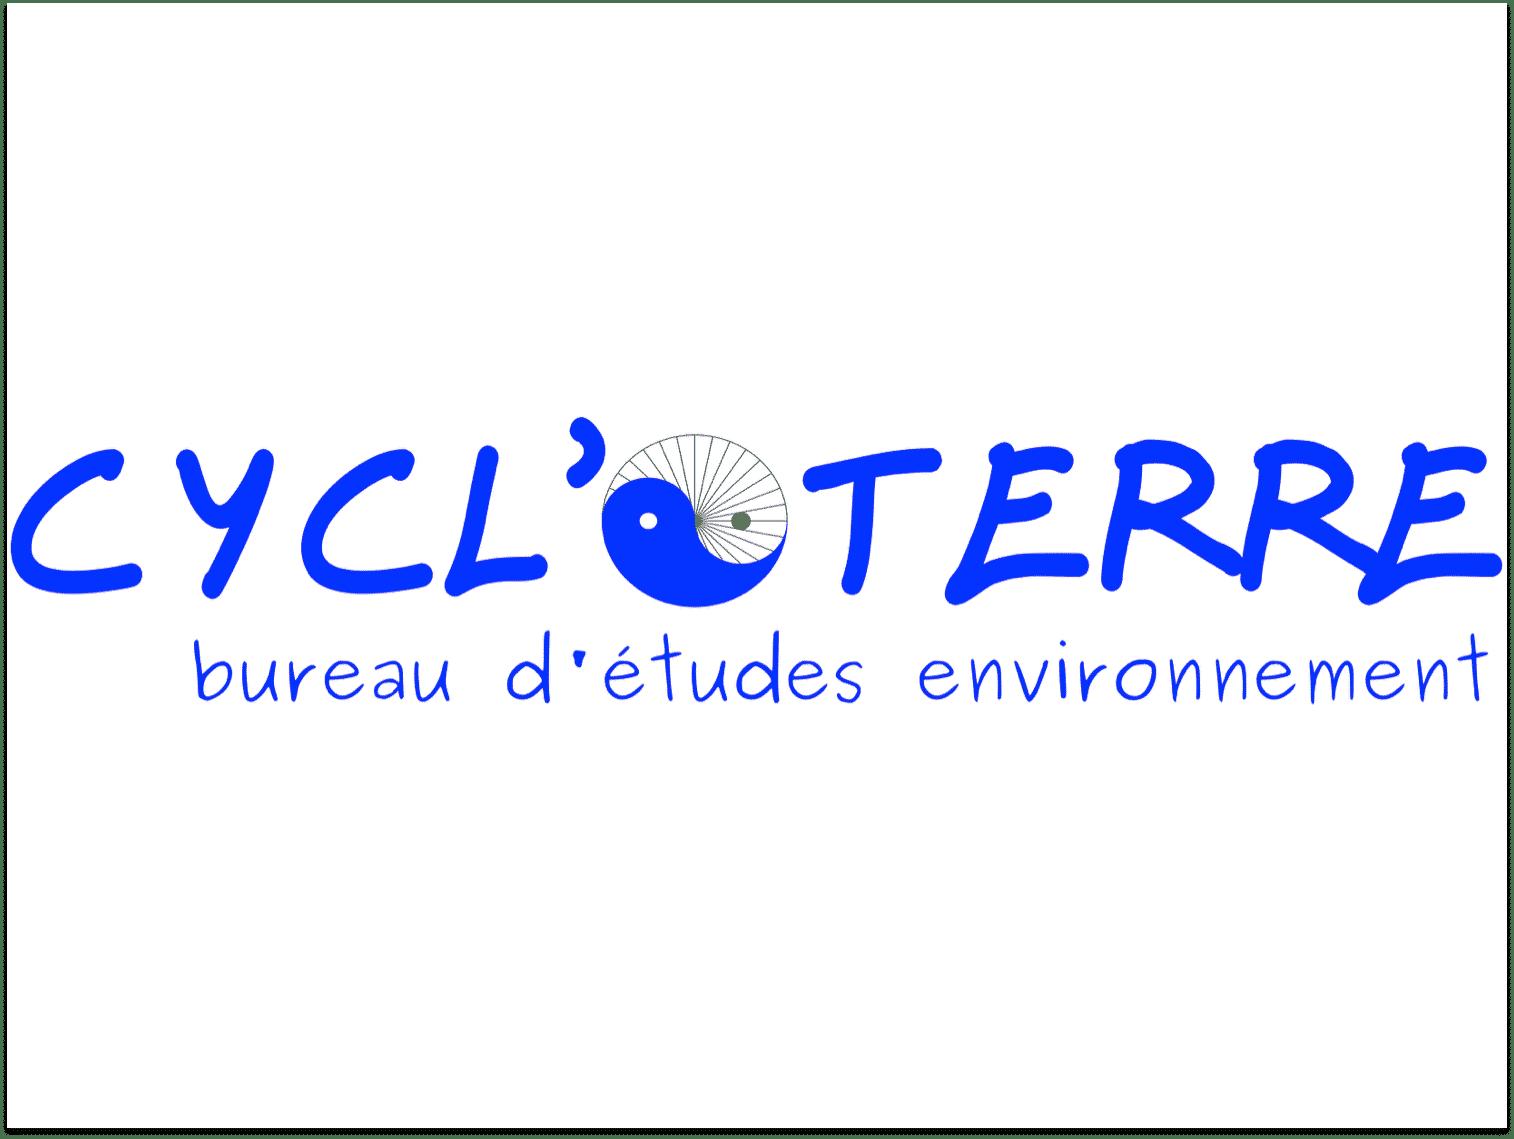 CYCL'O'TERRE